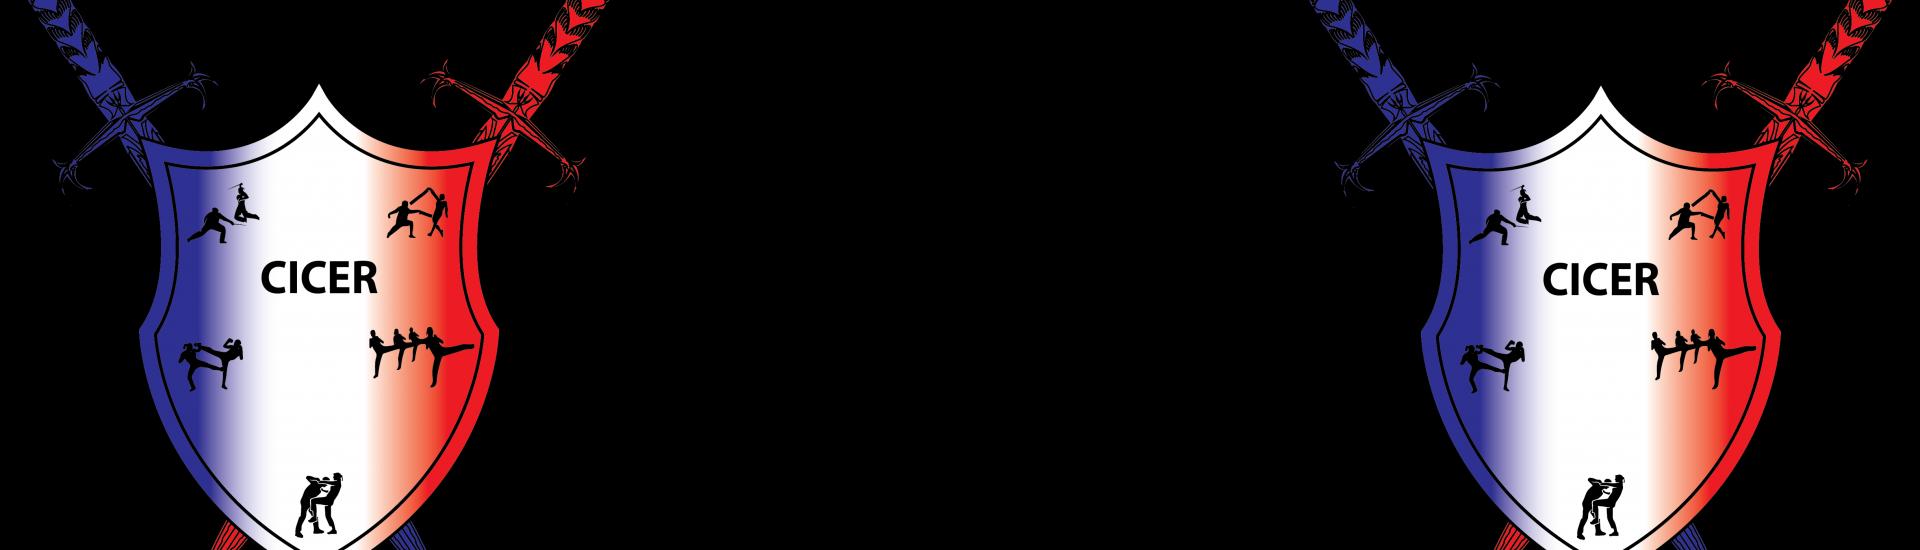 banToutesDisciplines-01